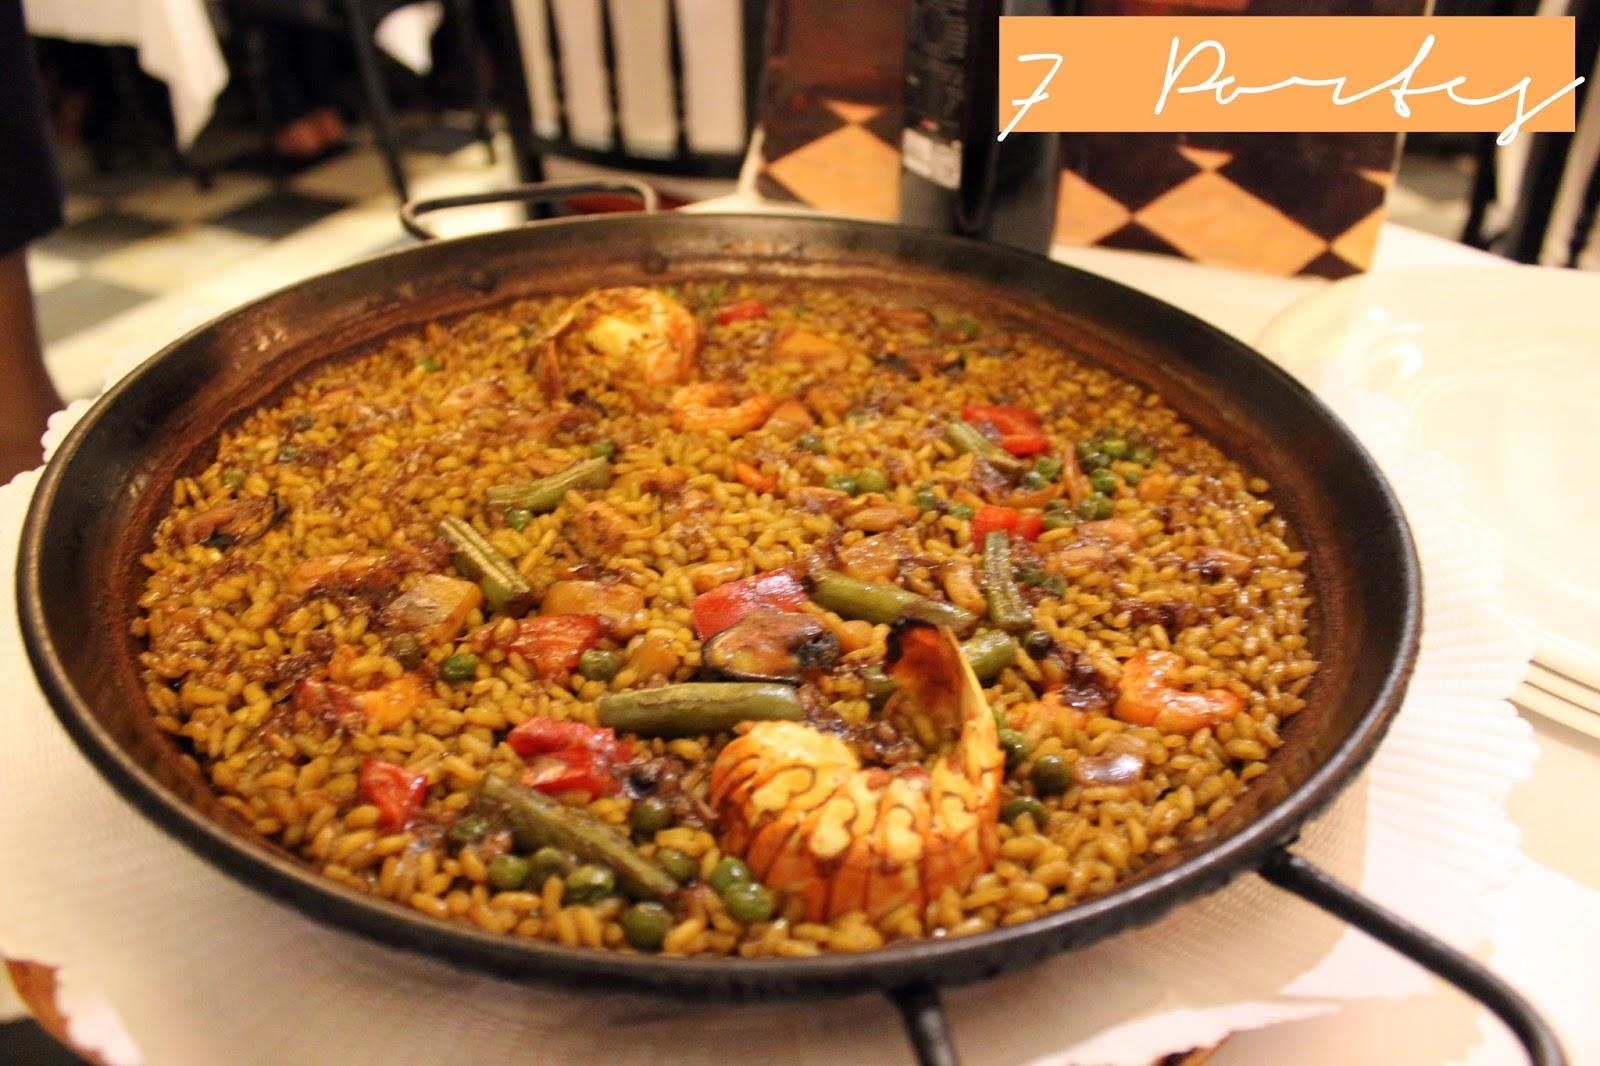 Barcelona Travel Diary Restaurant Eis Tapas Paella Tipps TheBlondeLion Empfehlung Reisebericht